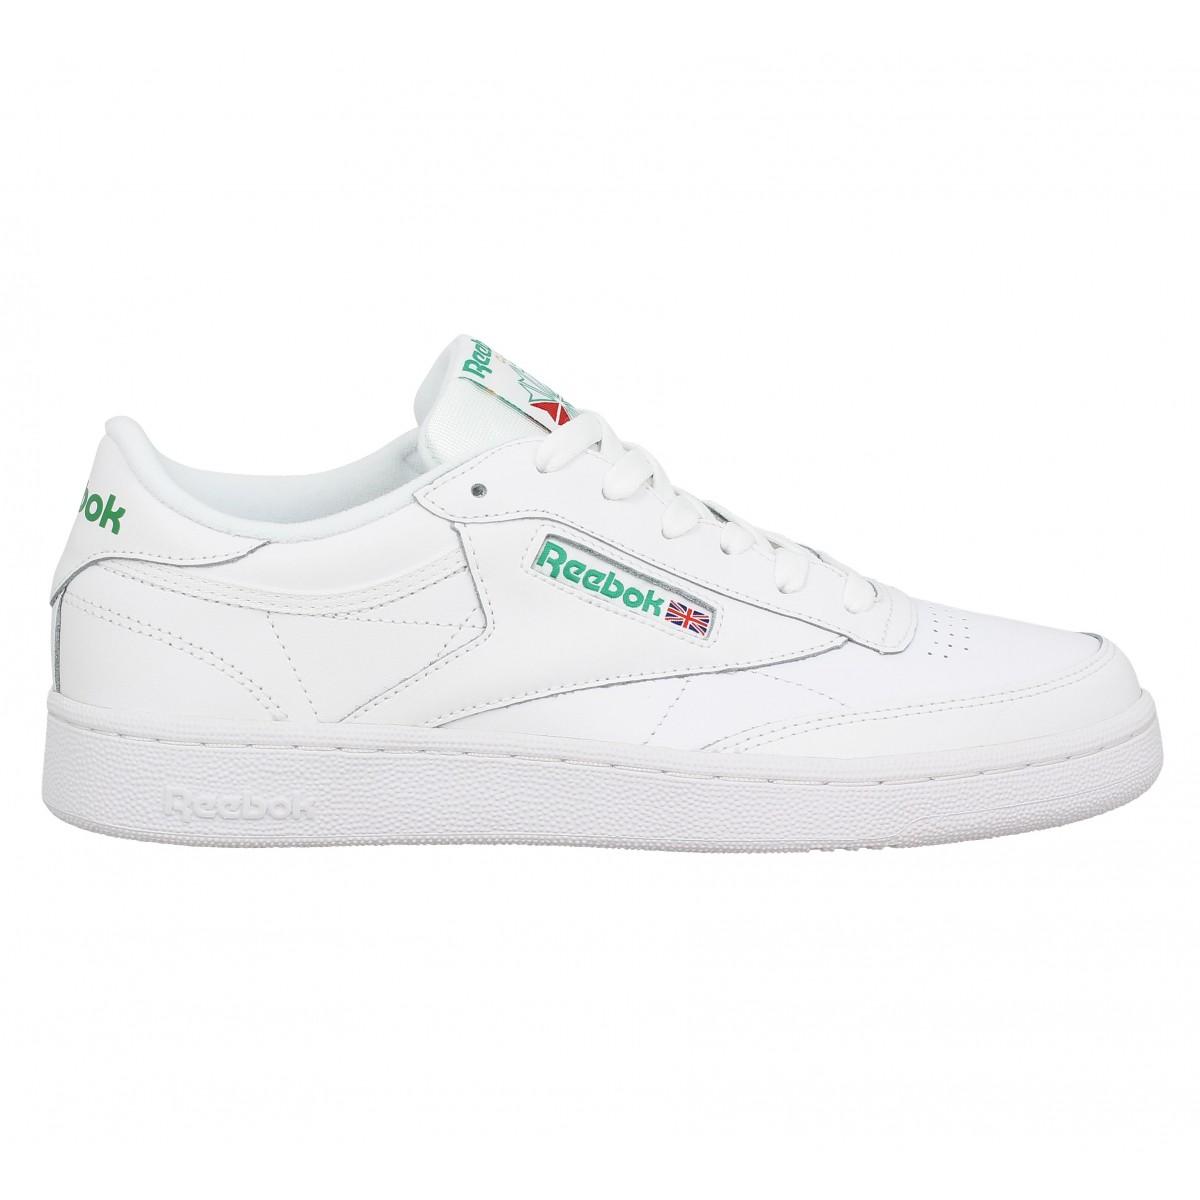 Chaussures Reebok Club C blanches homme dOmOwW